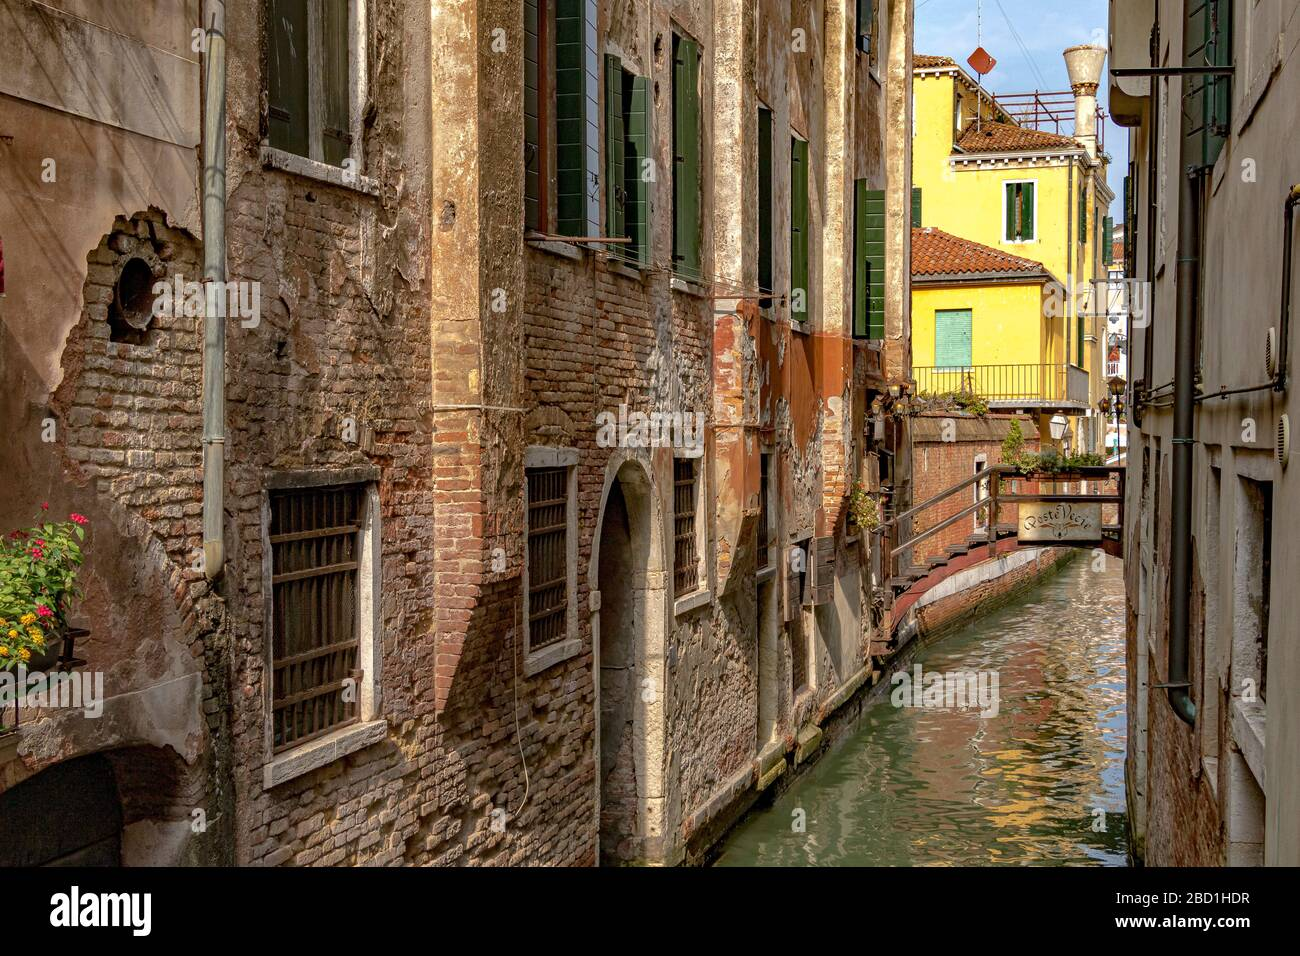 A narrow canal with a small wooden bridge leading to Poste Vecie an Italian restaurant near Rialto fish market in Venice,Italy Stock Photo